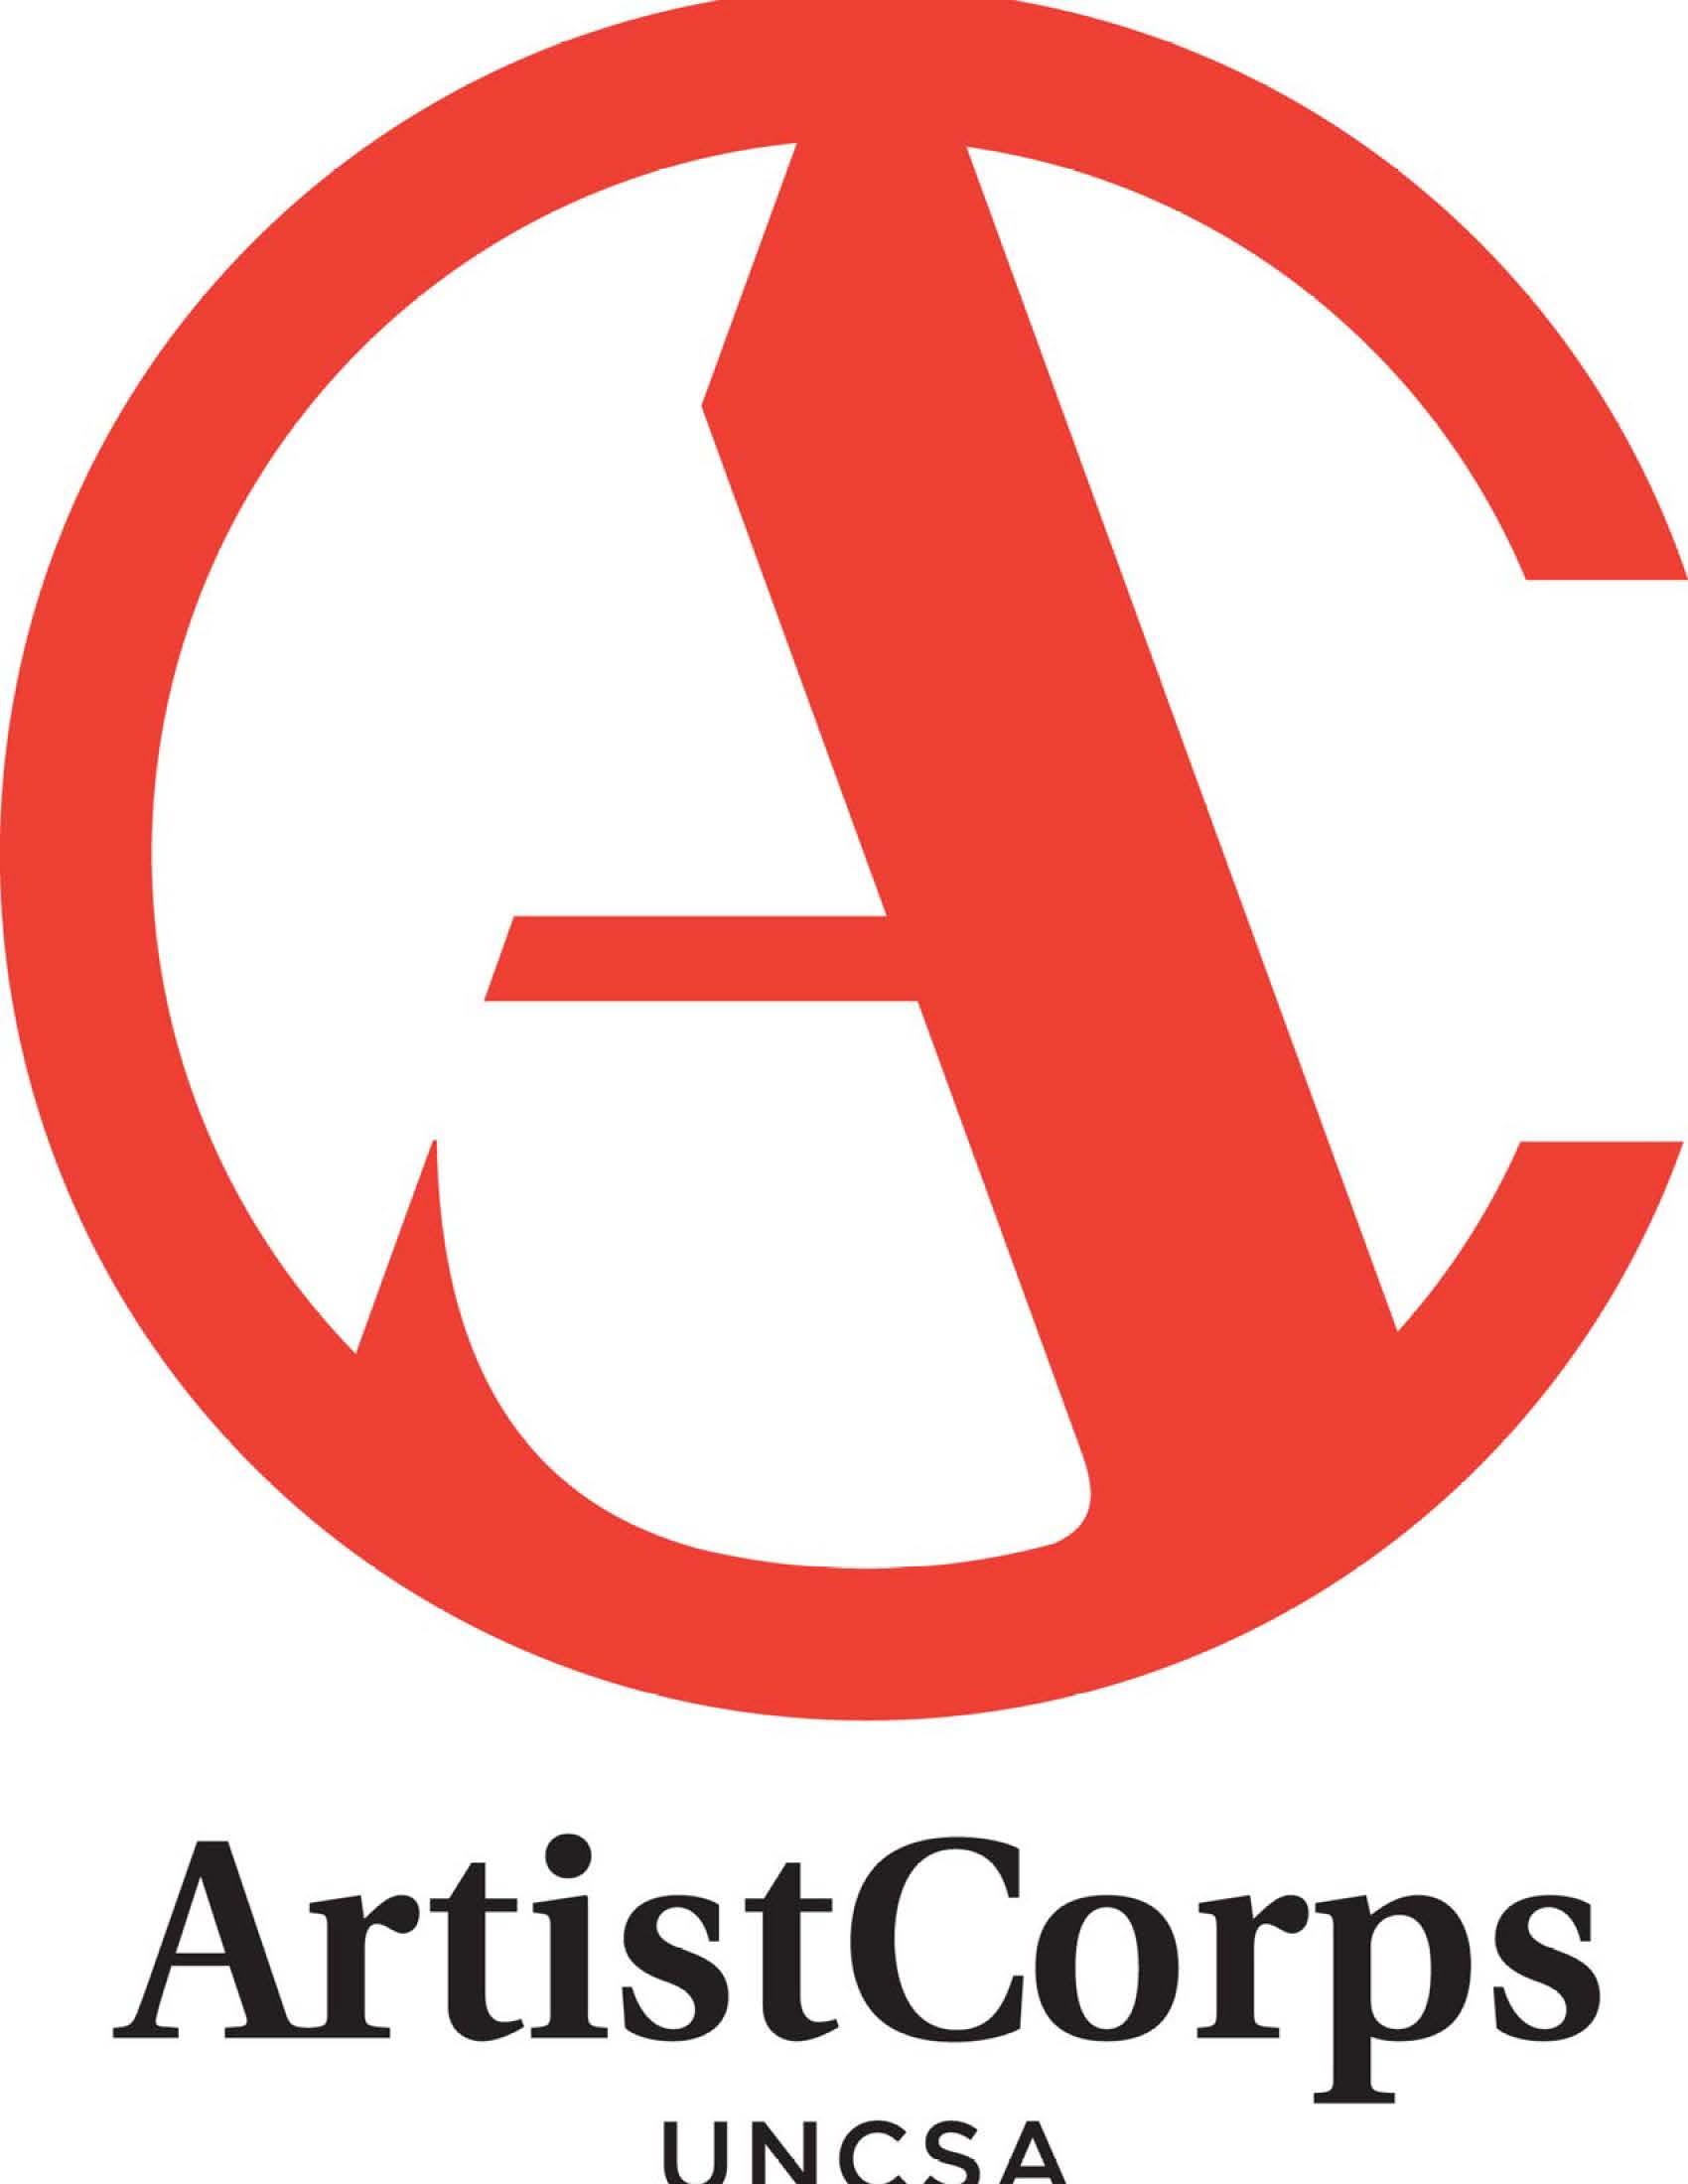 artistcorps-logo-red